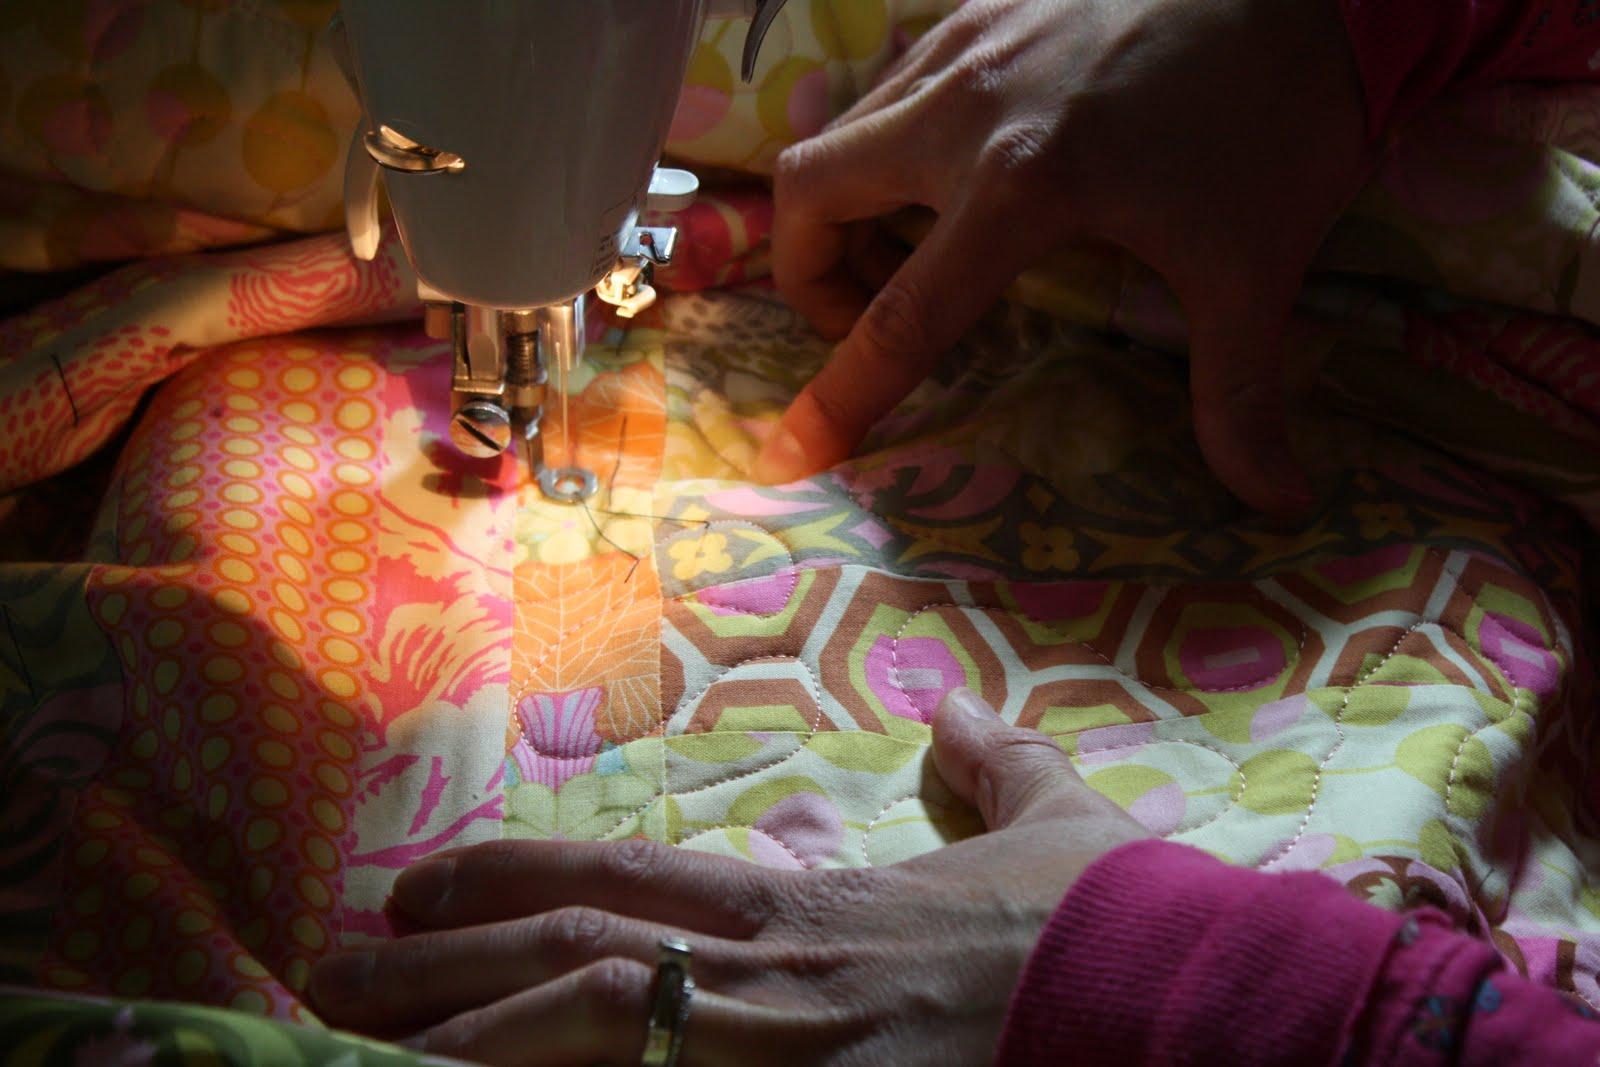 sewing machine applique u tube